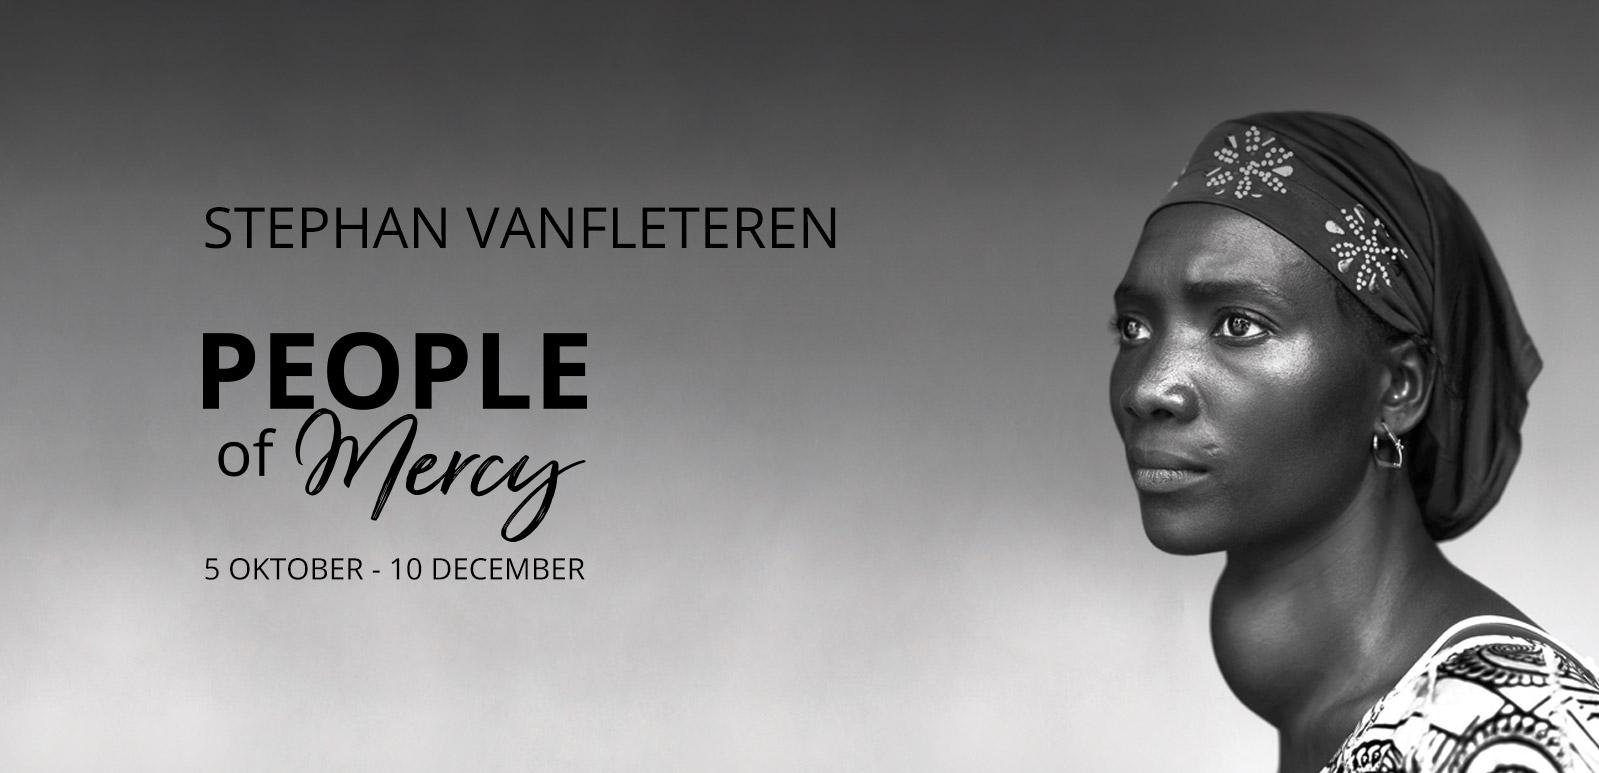 Stephan-Vanfleteren-People-of-Mercy-Tentoonstelling-Antwerpen